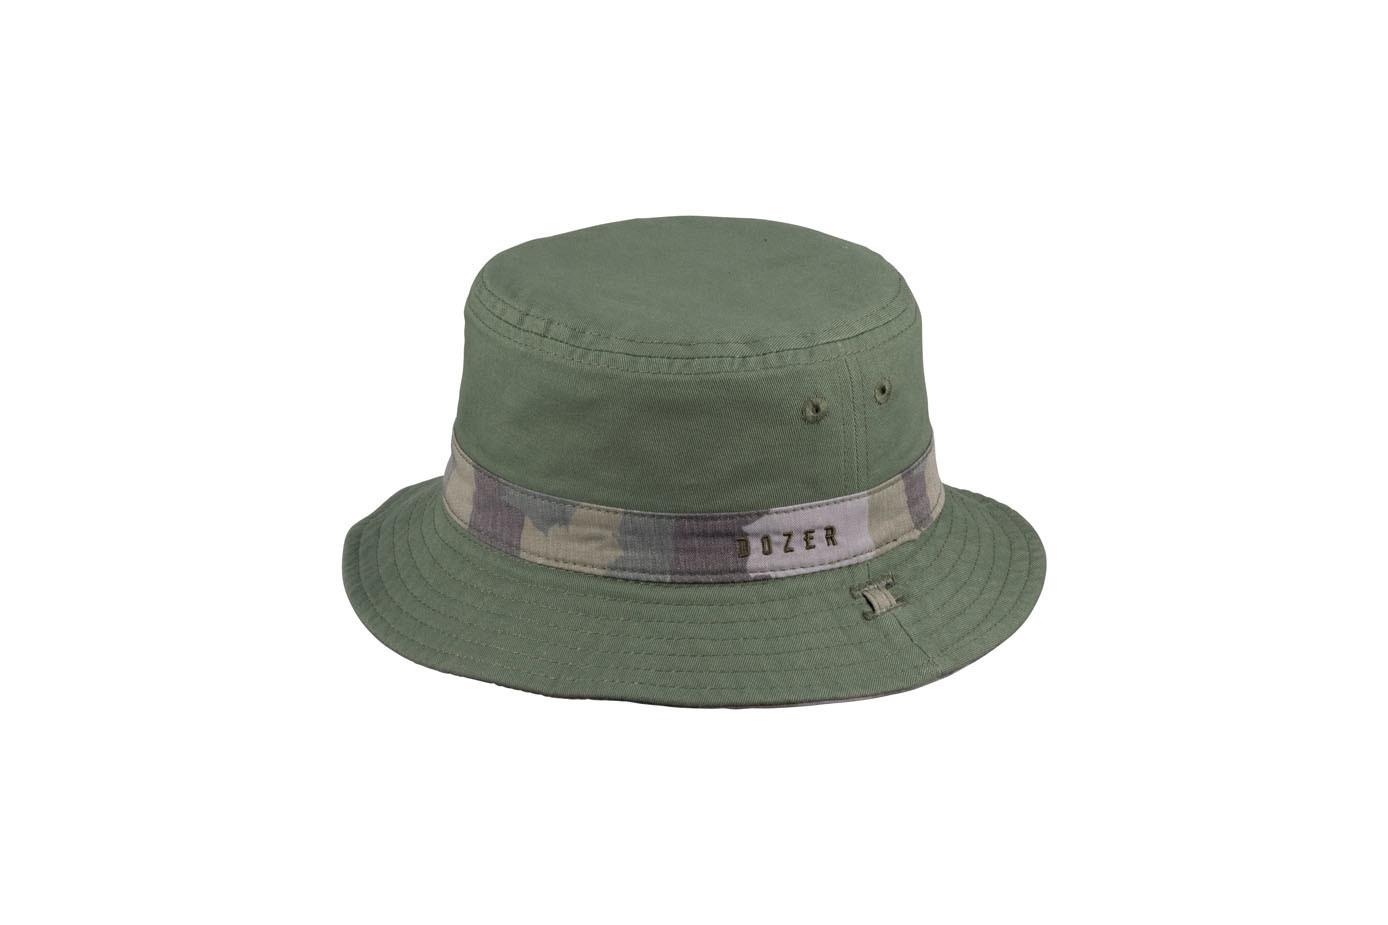 Millymook and Dozer Boys Bucket Sun Hat - Zachary S (2-5y)